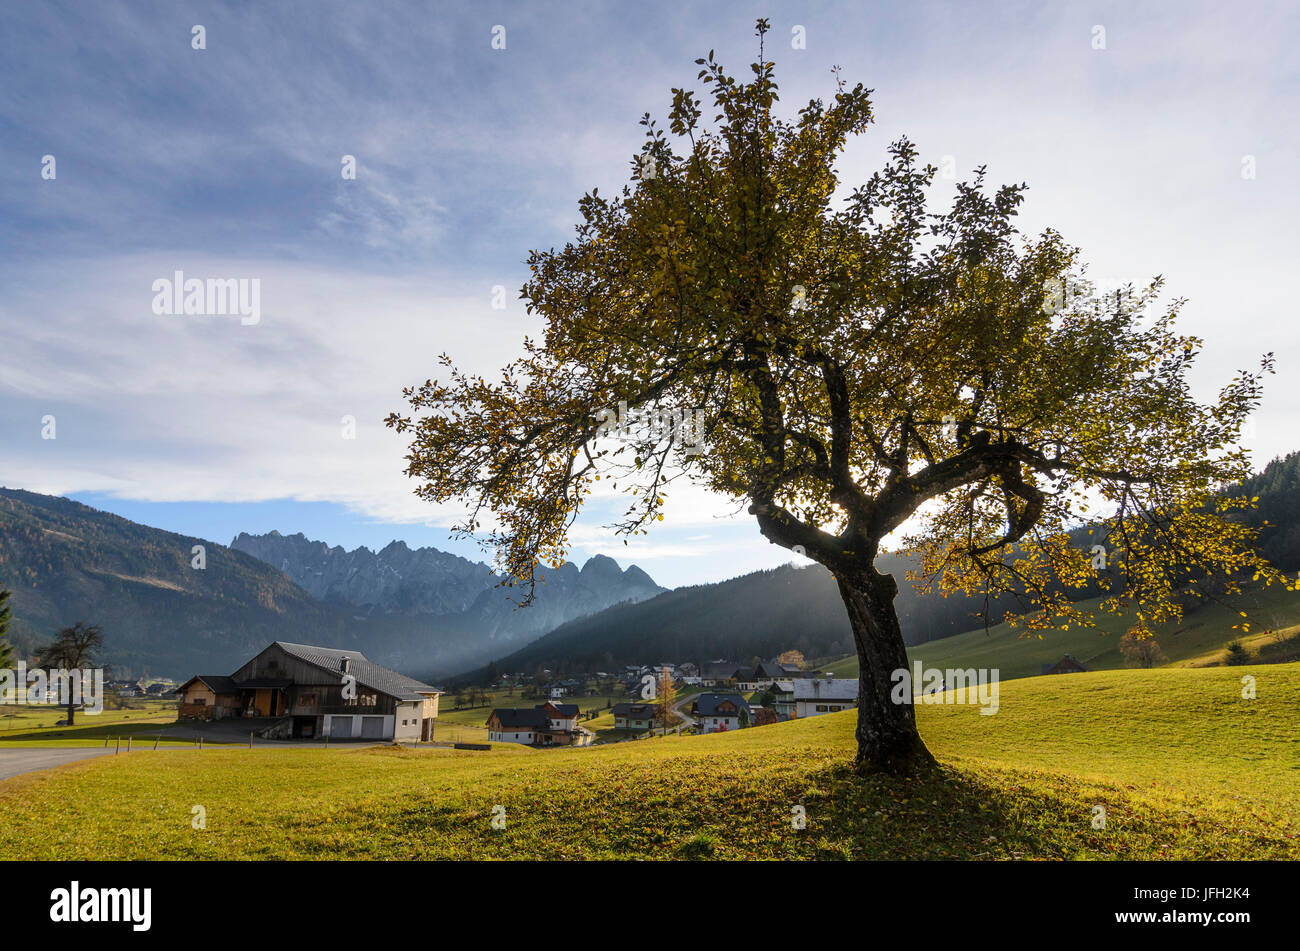 Farmhouses and Gosaukamm, Austria, Upper Austria, Salzkammergut, Gosau - Stock Image